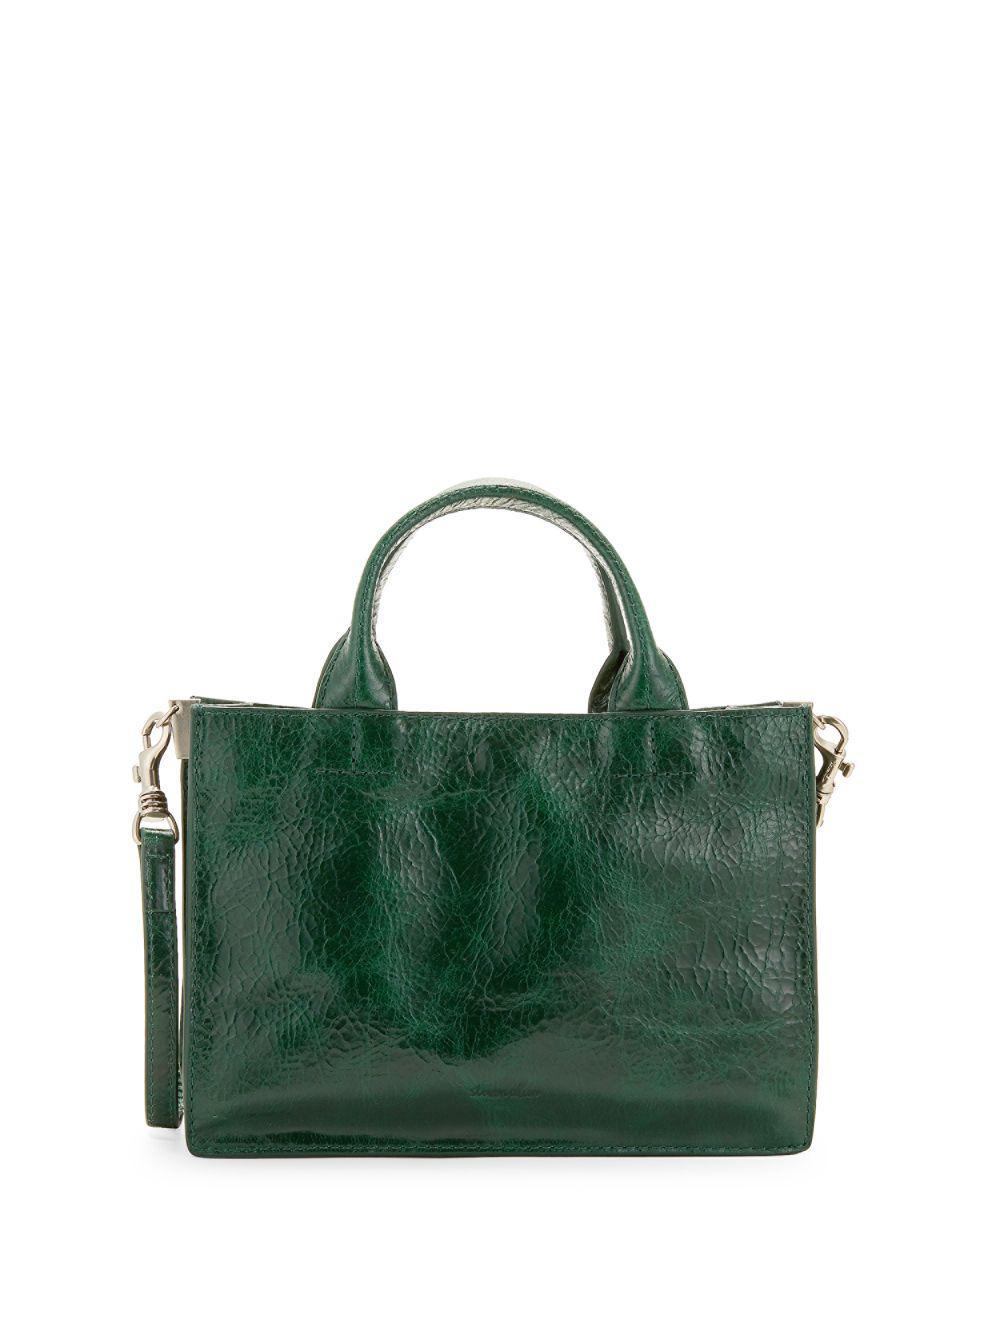 024ea14642d8 Lyst - Steven Alan Classic Leather Crossbody Bag in Green